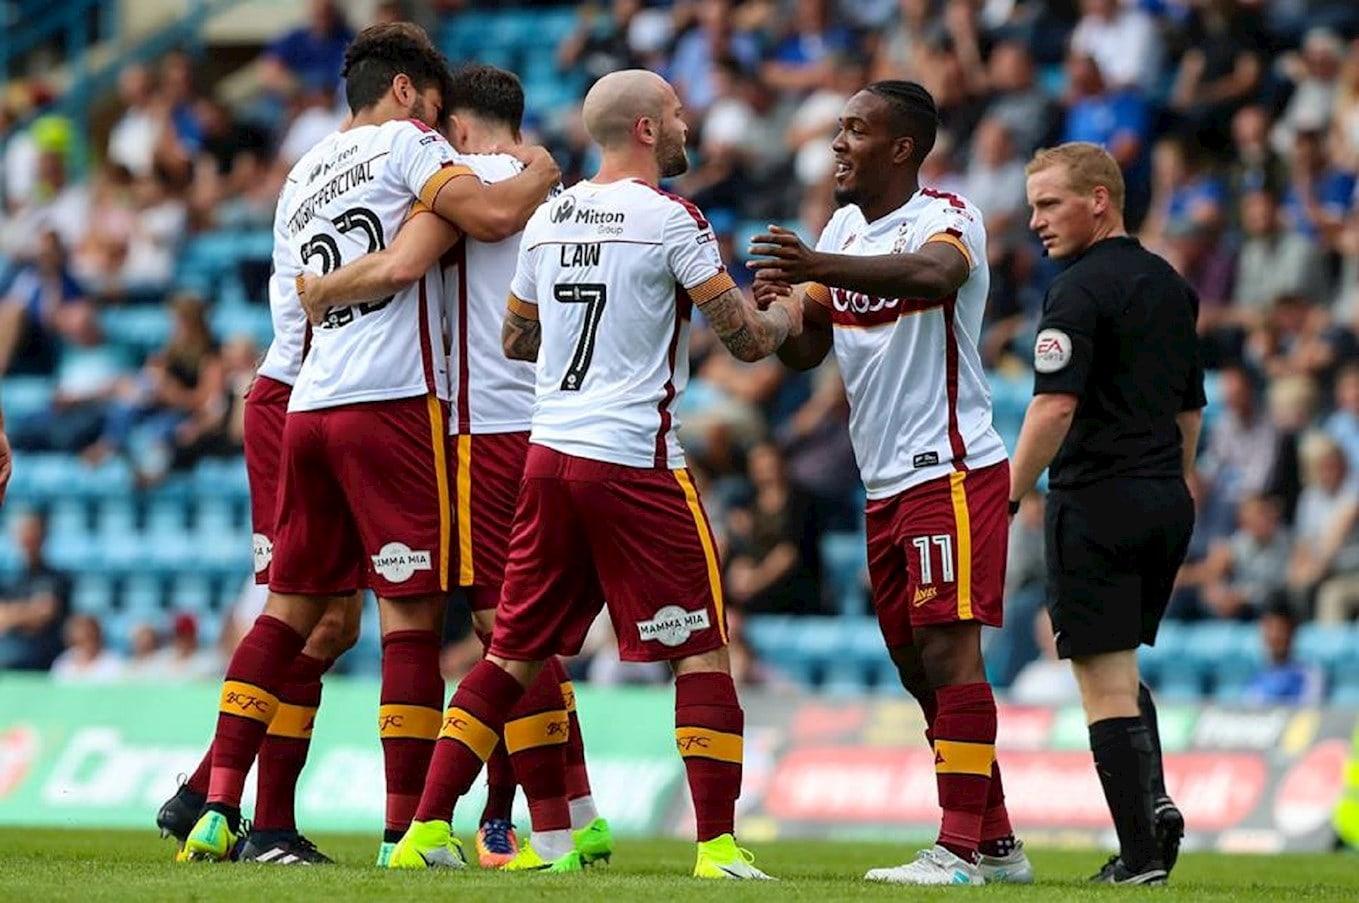 Bradford v Gainsborough featured picks